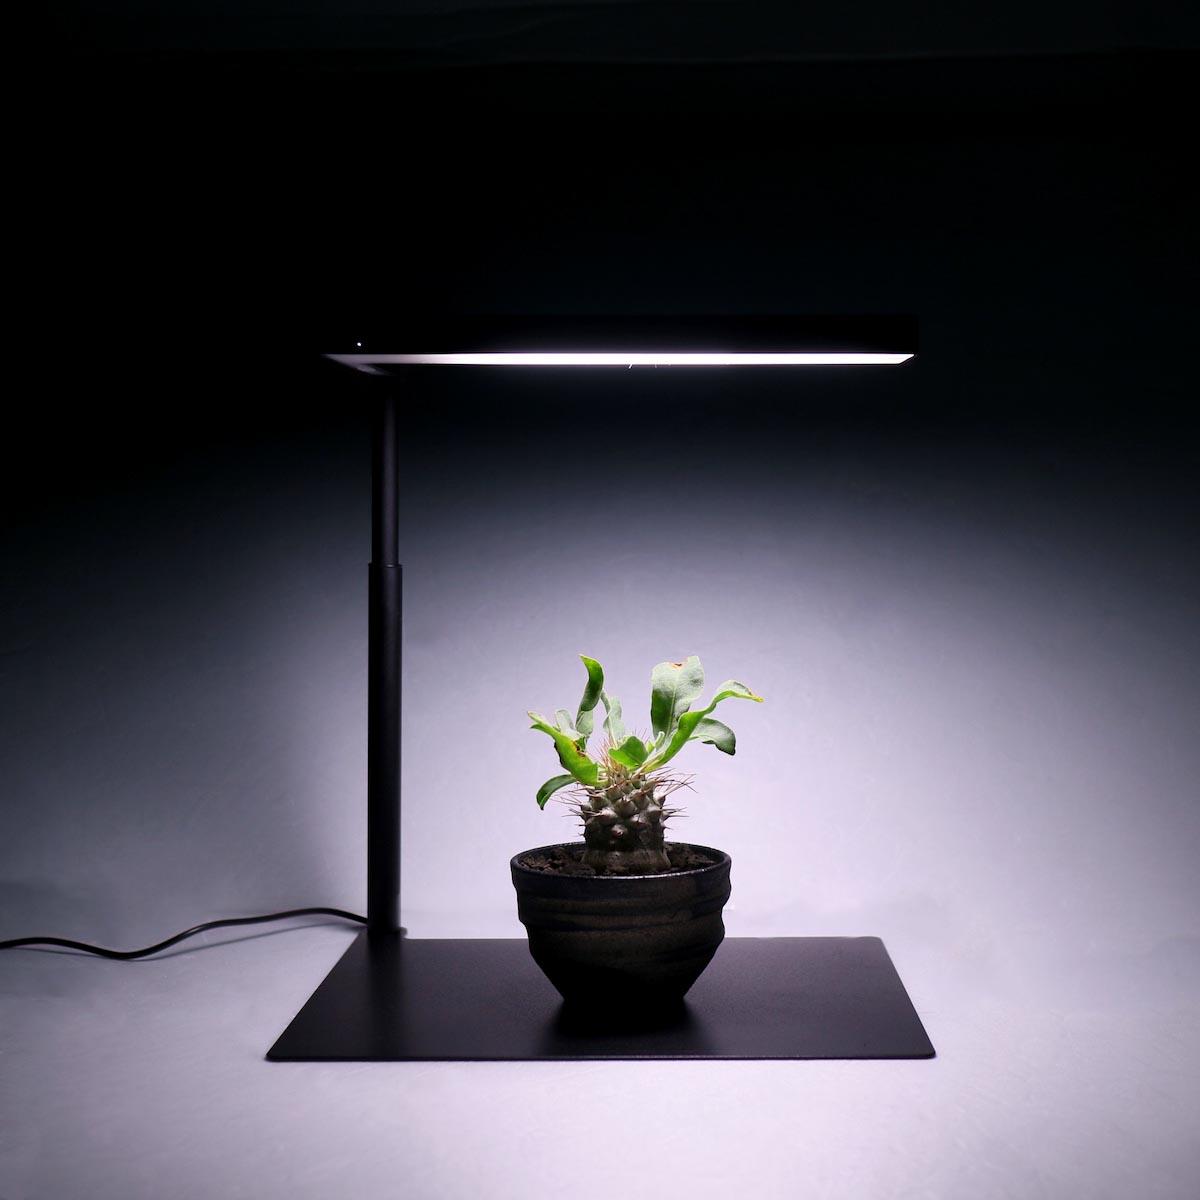 BOTANIZE / EXOTIC PLANT CULTIVATION LIGHT